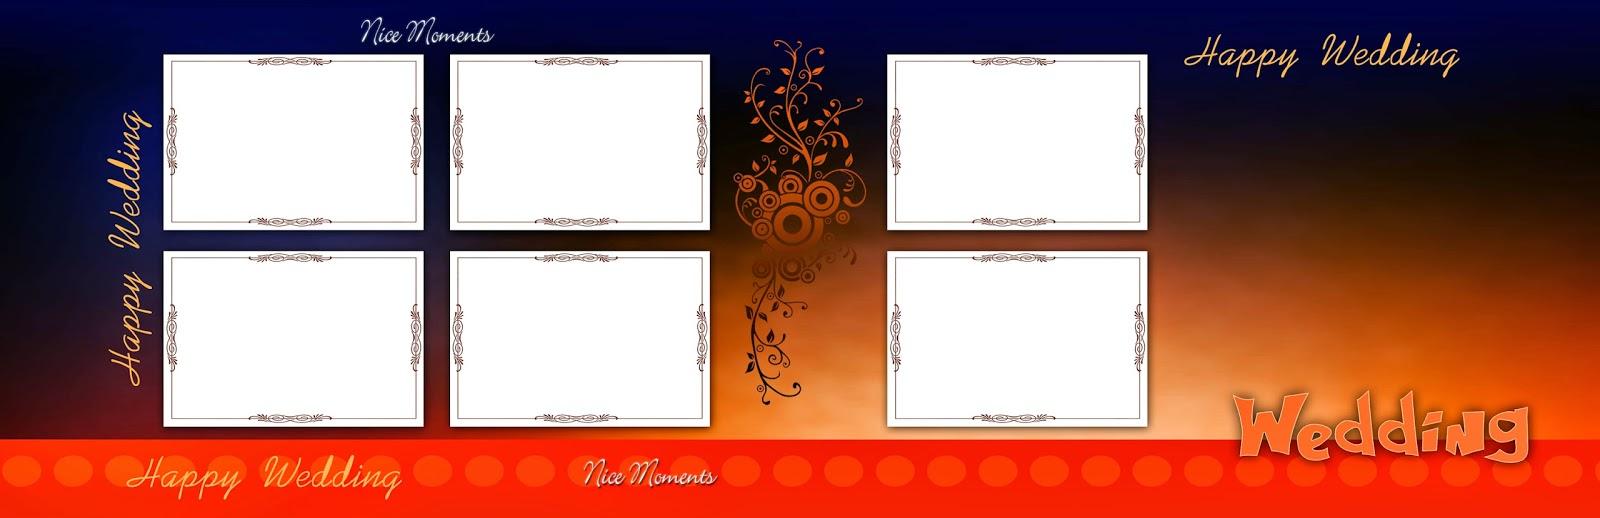 40 New 12x36 karizma wedding album backgrounds psd files free ...